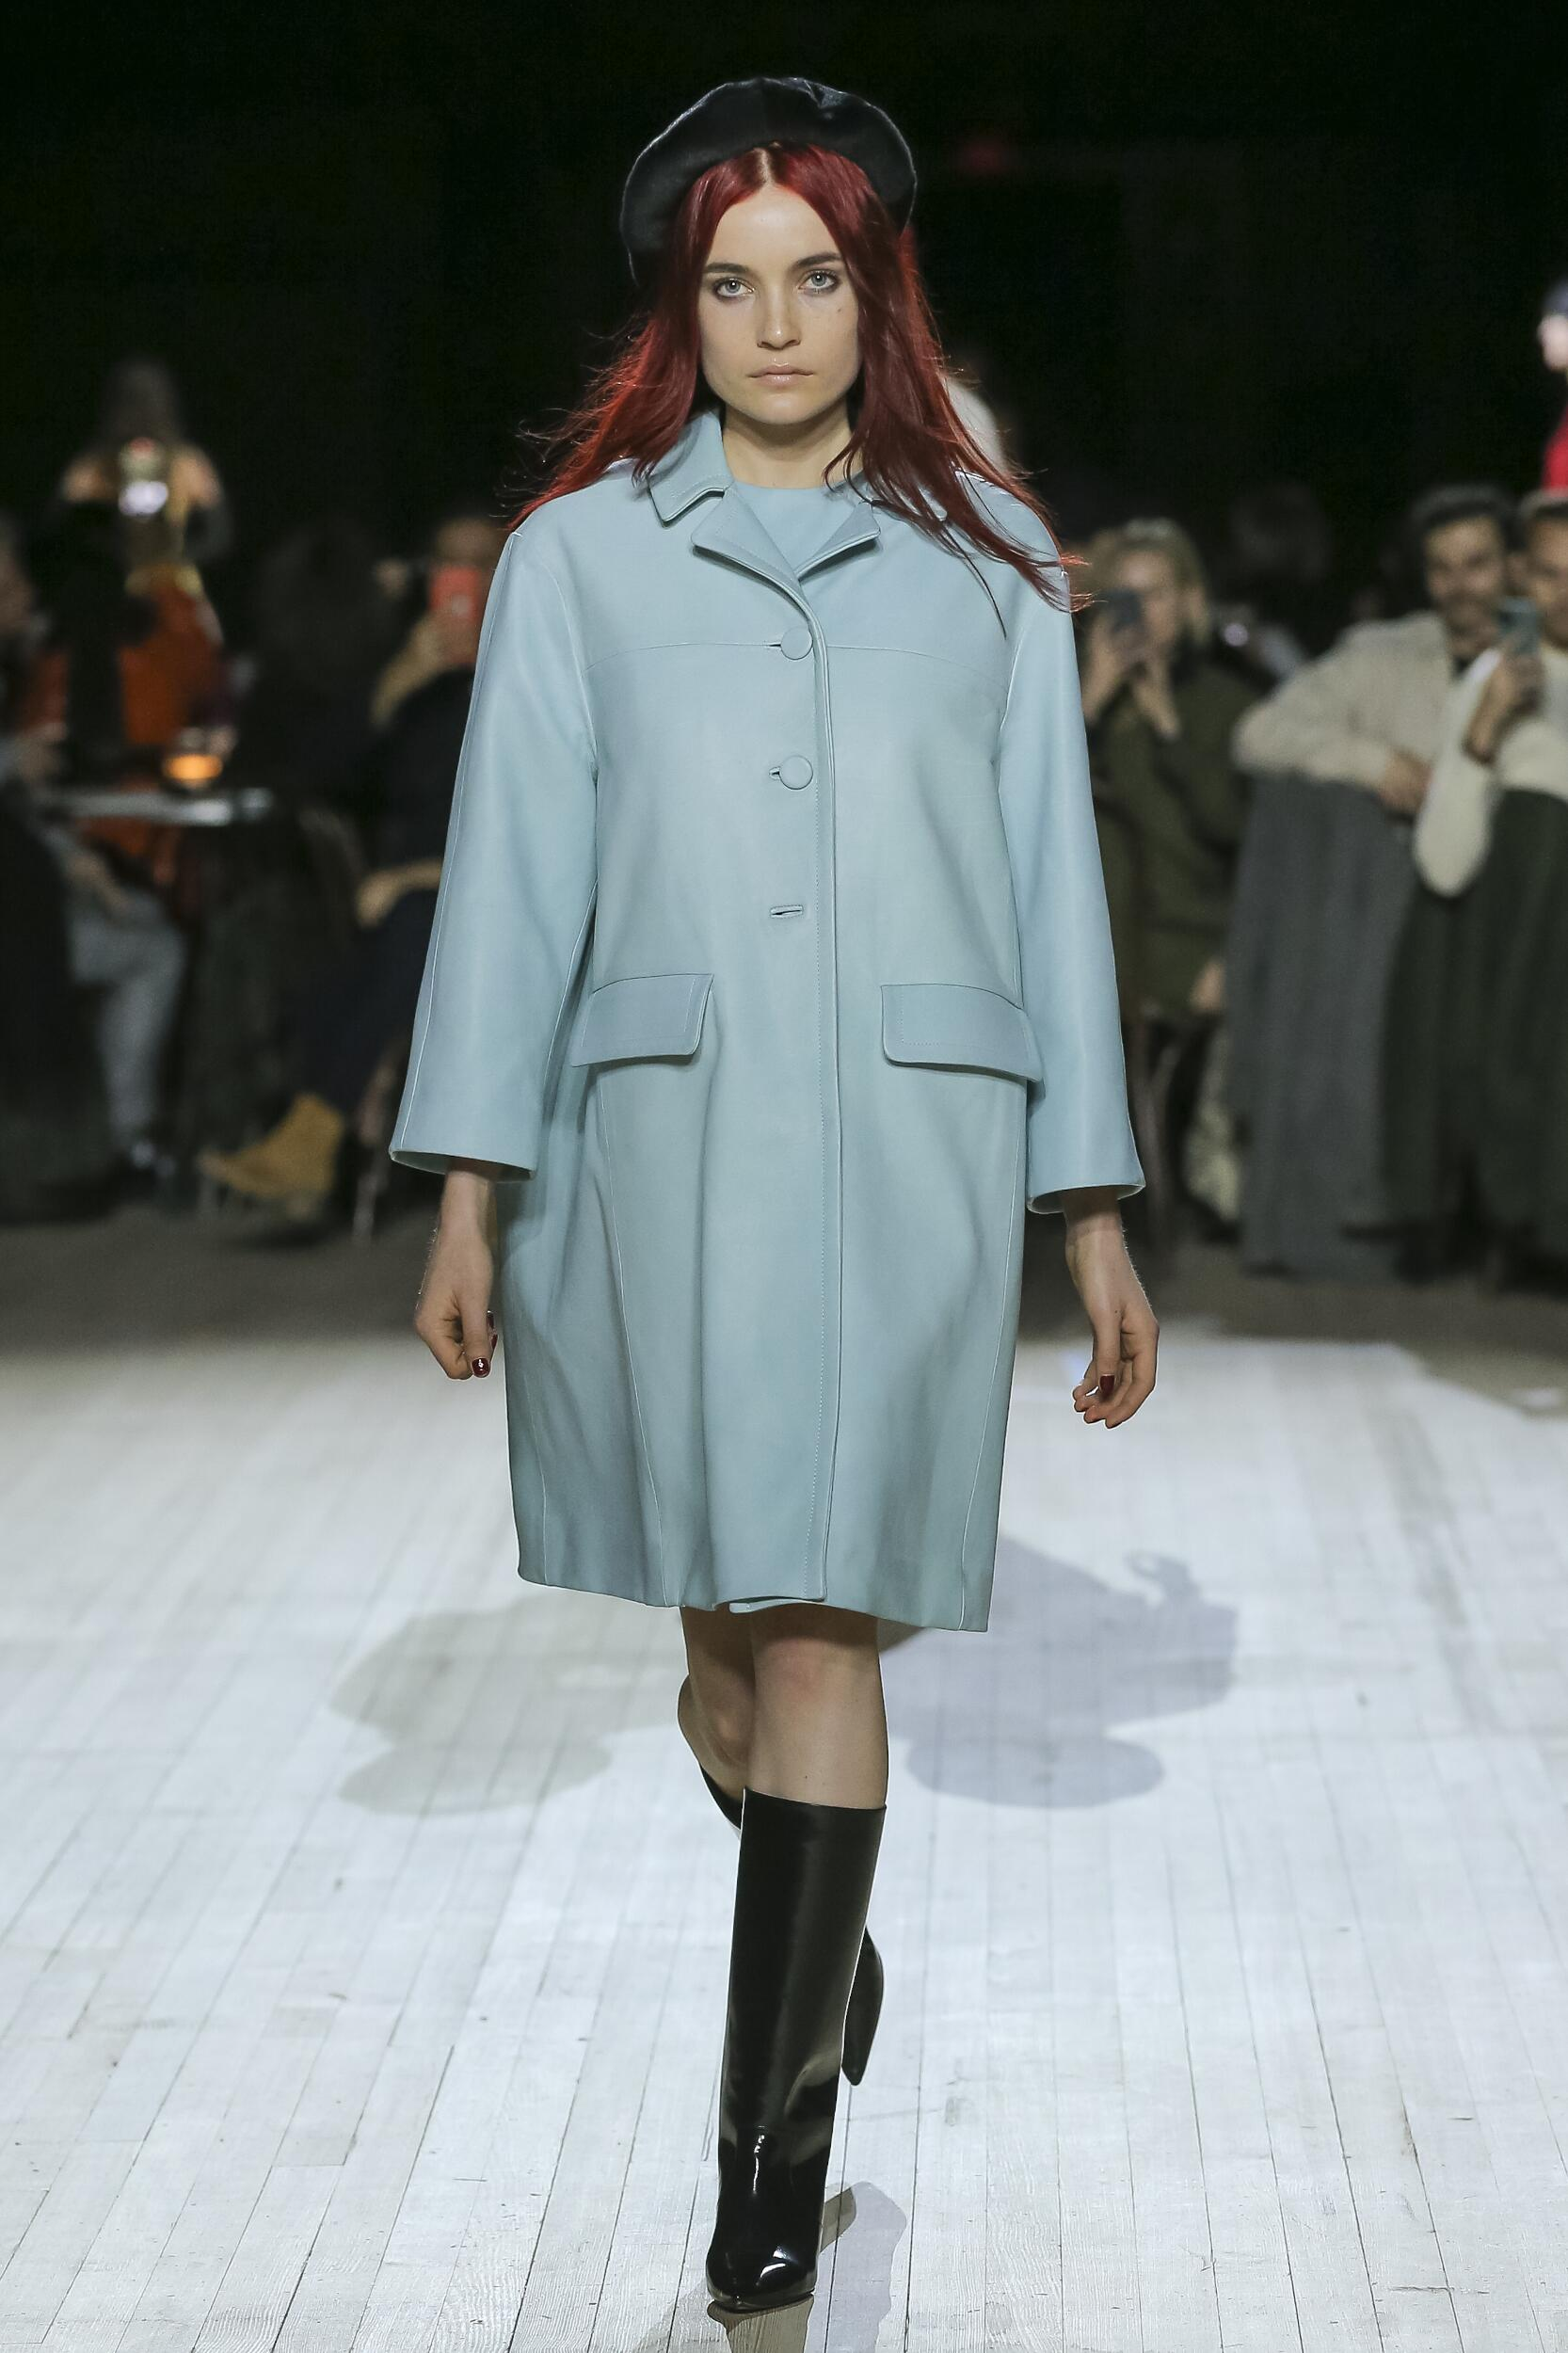 Marc Jacobs Womenswear Fashion Show